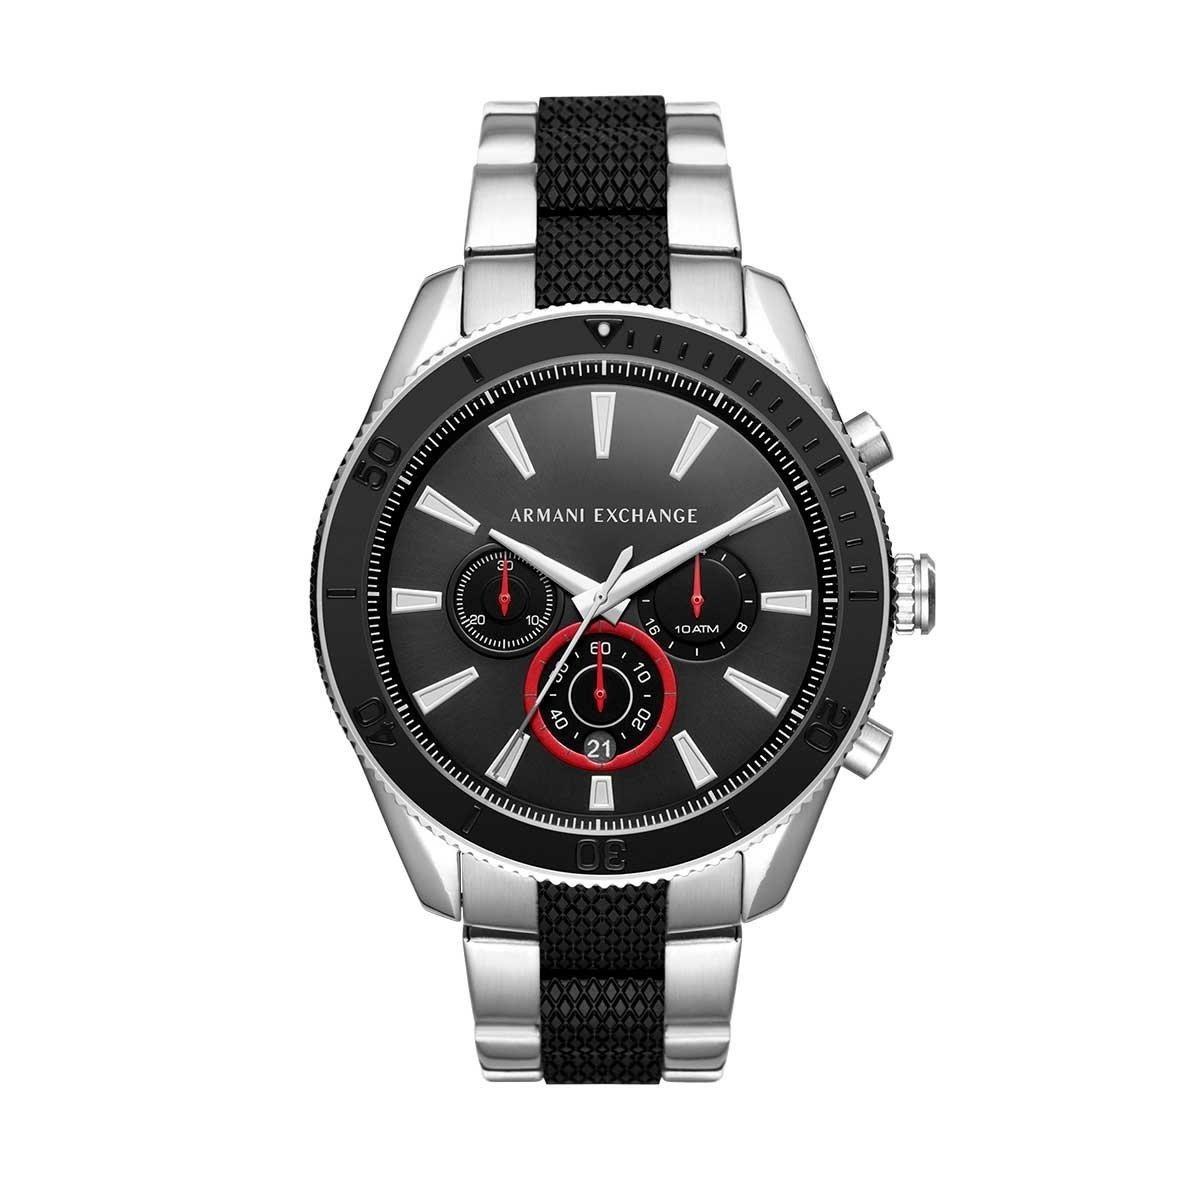 5c52a4951cd9 reloj armani exchange ax1813 platedo negro original p él. Cargando zoom.